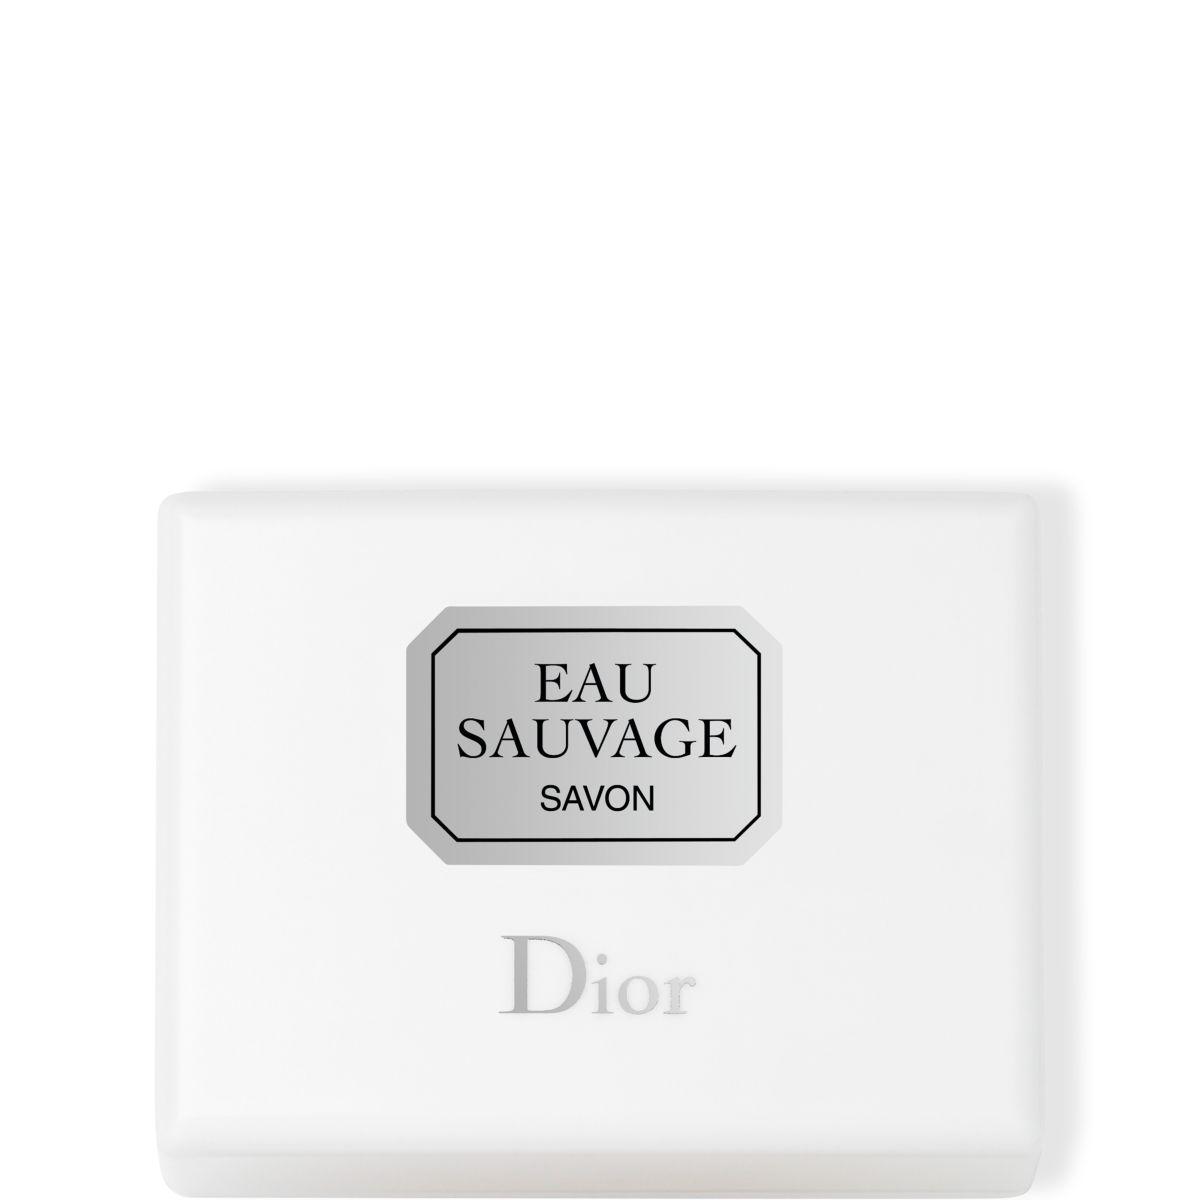 Dior - Eau Sauvage - Savon 150 g